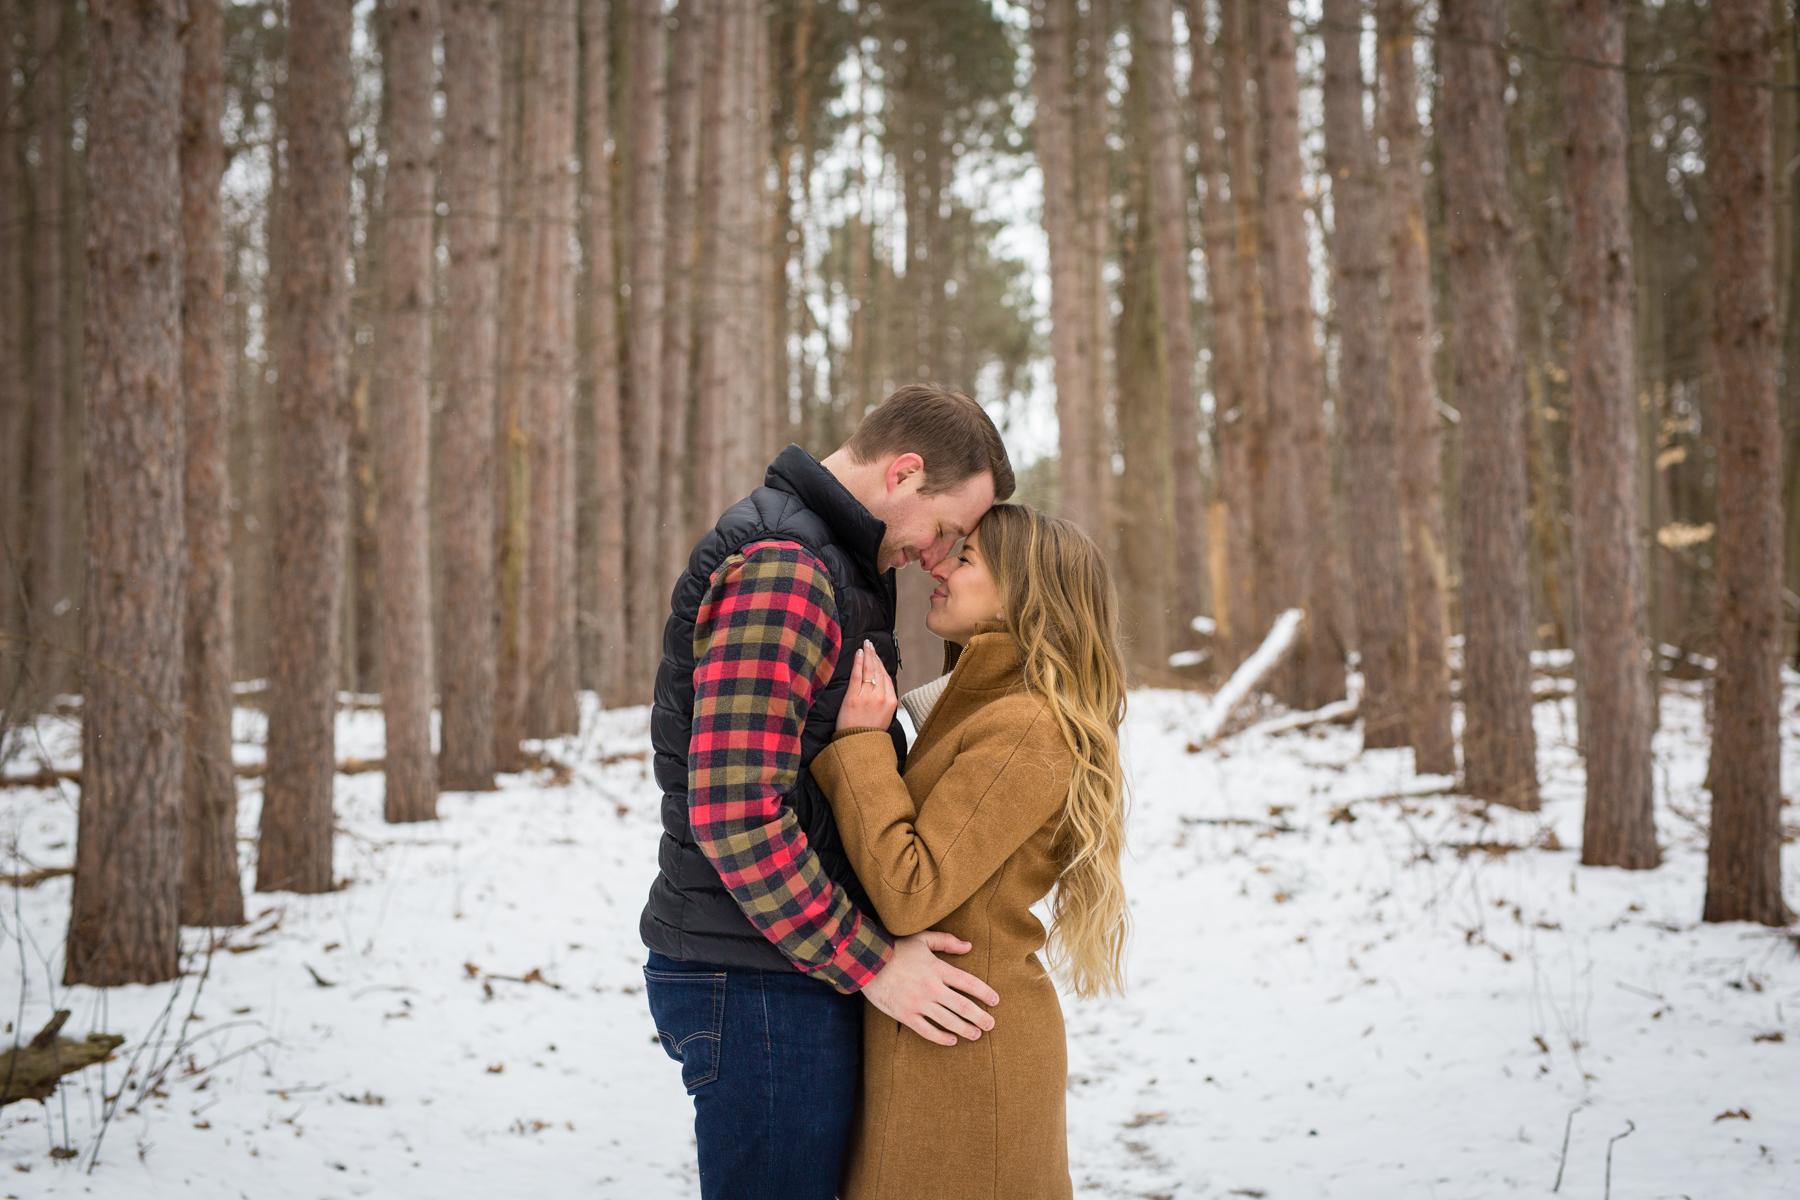 Doug&Kara_winter_Engagment_Photos_Brandon_Shafer_Photography_Blog-27.jpg